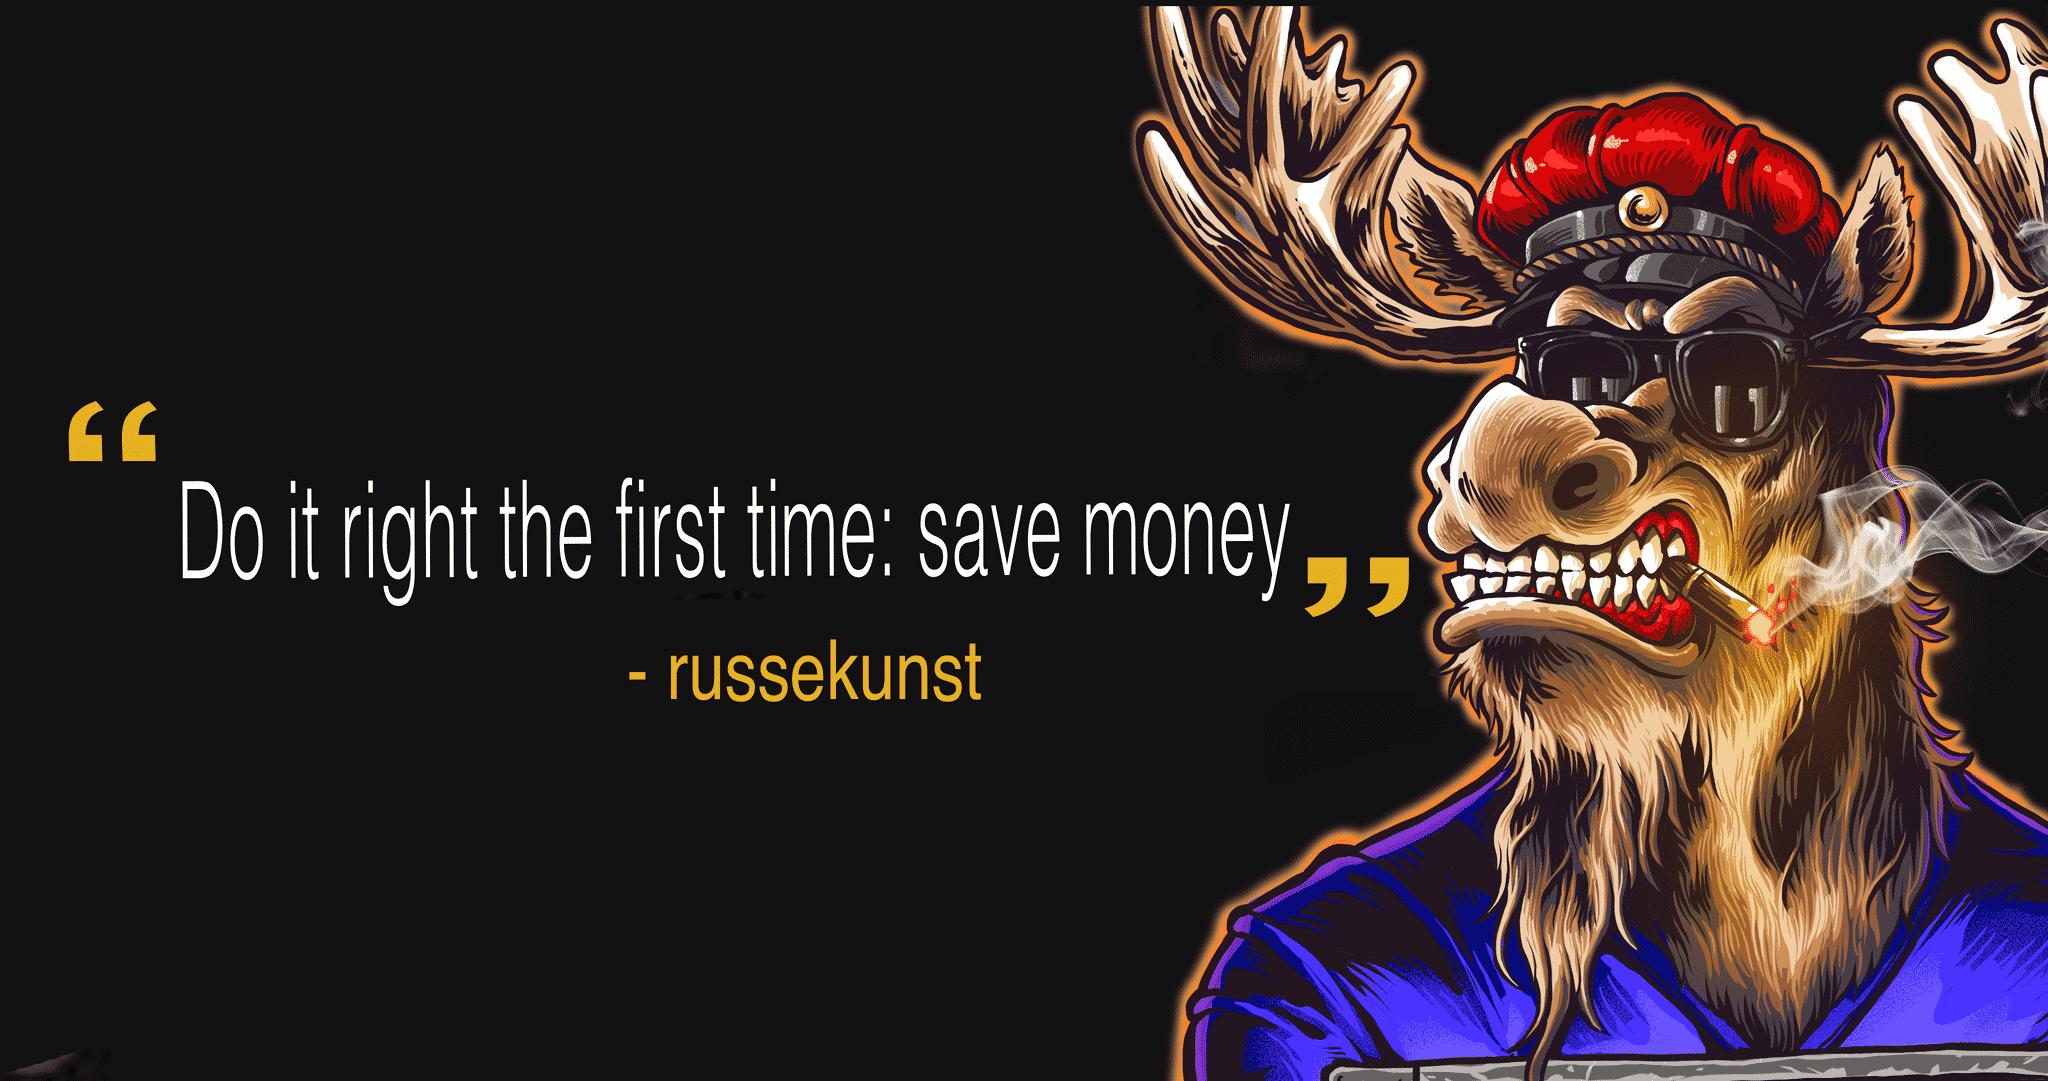 russekunst-prouder-tphn-lødde-russelogo-russetid